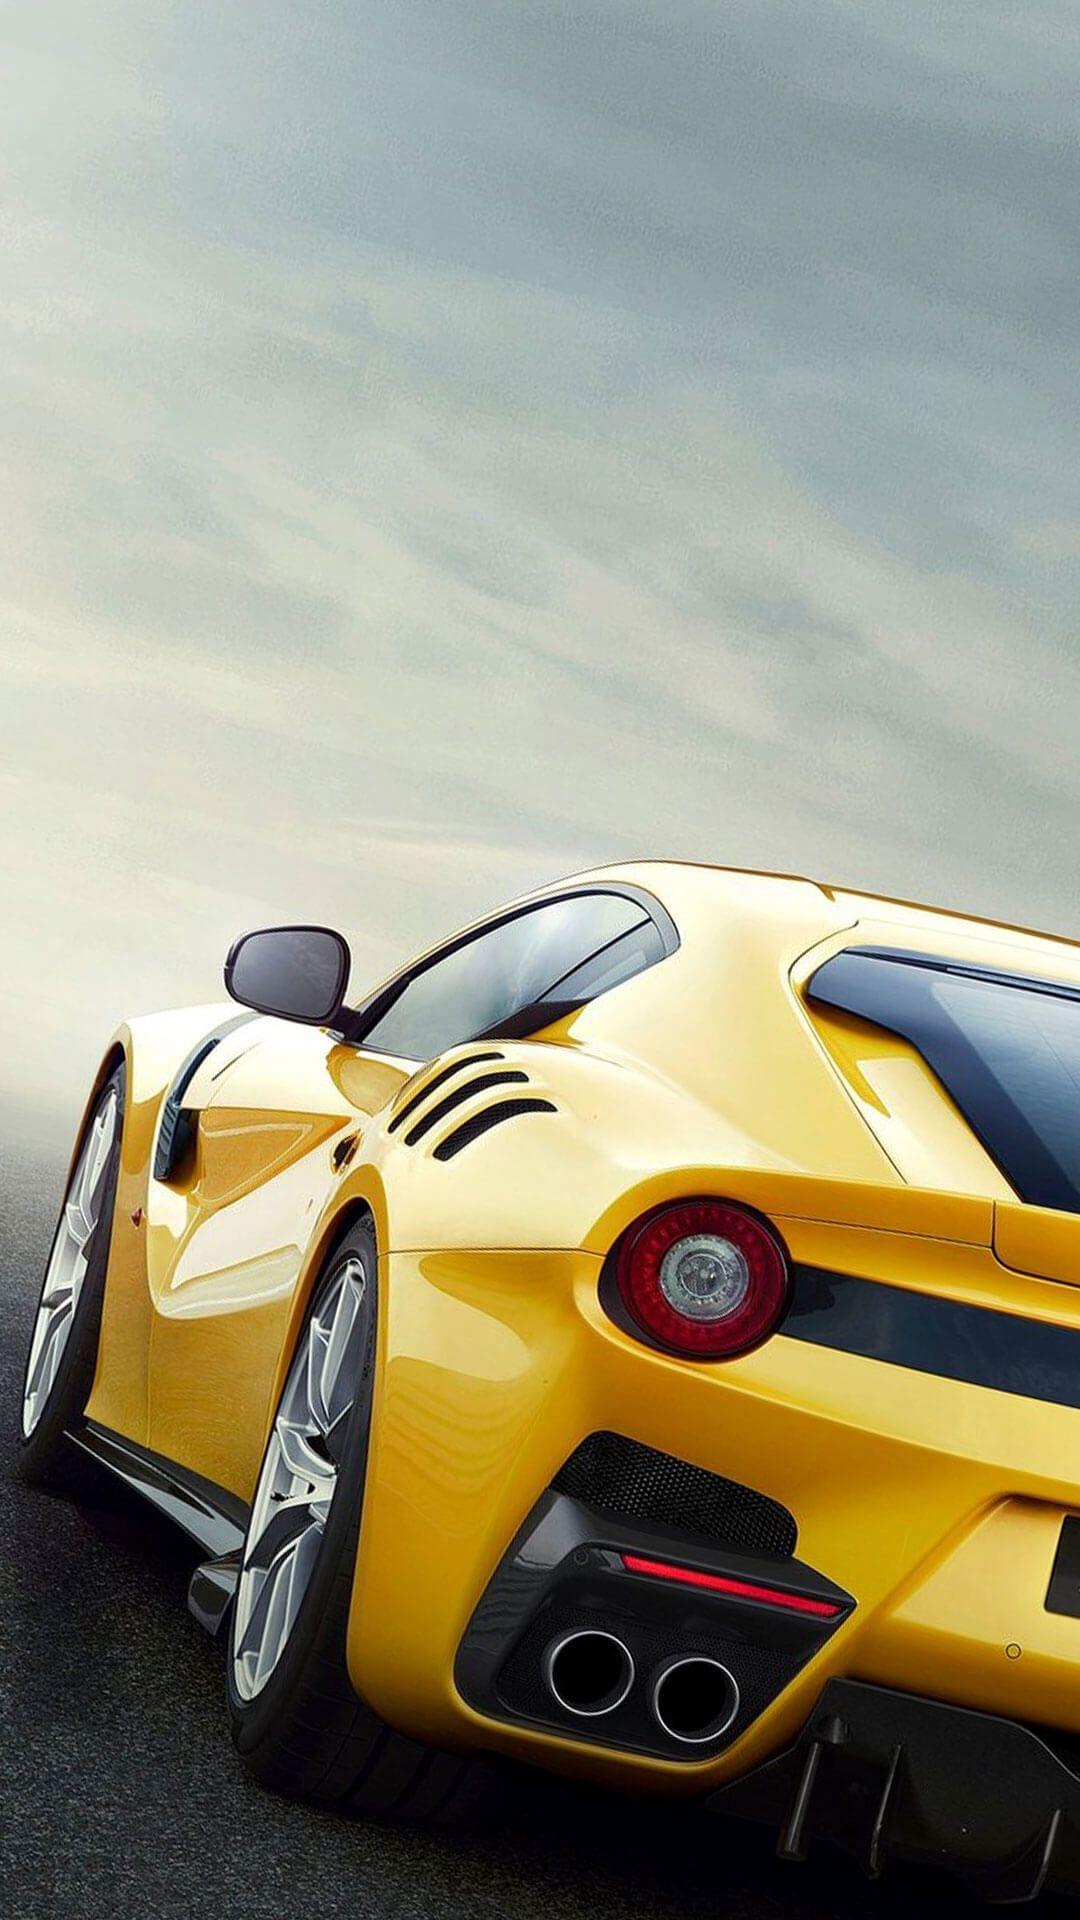 Ferrari Wallpaper Iphone Posted By Michelle Mercado